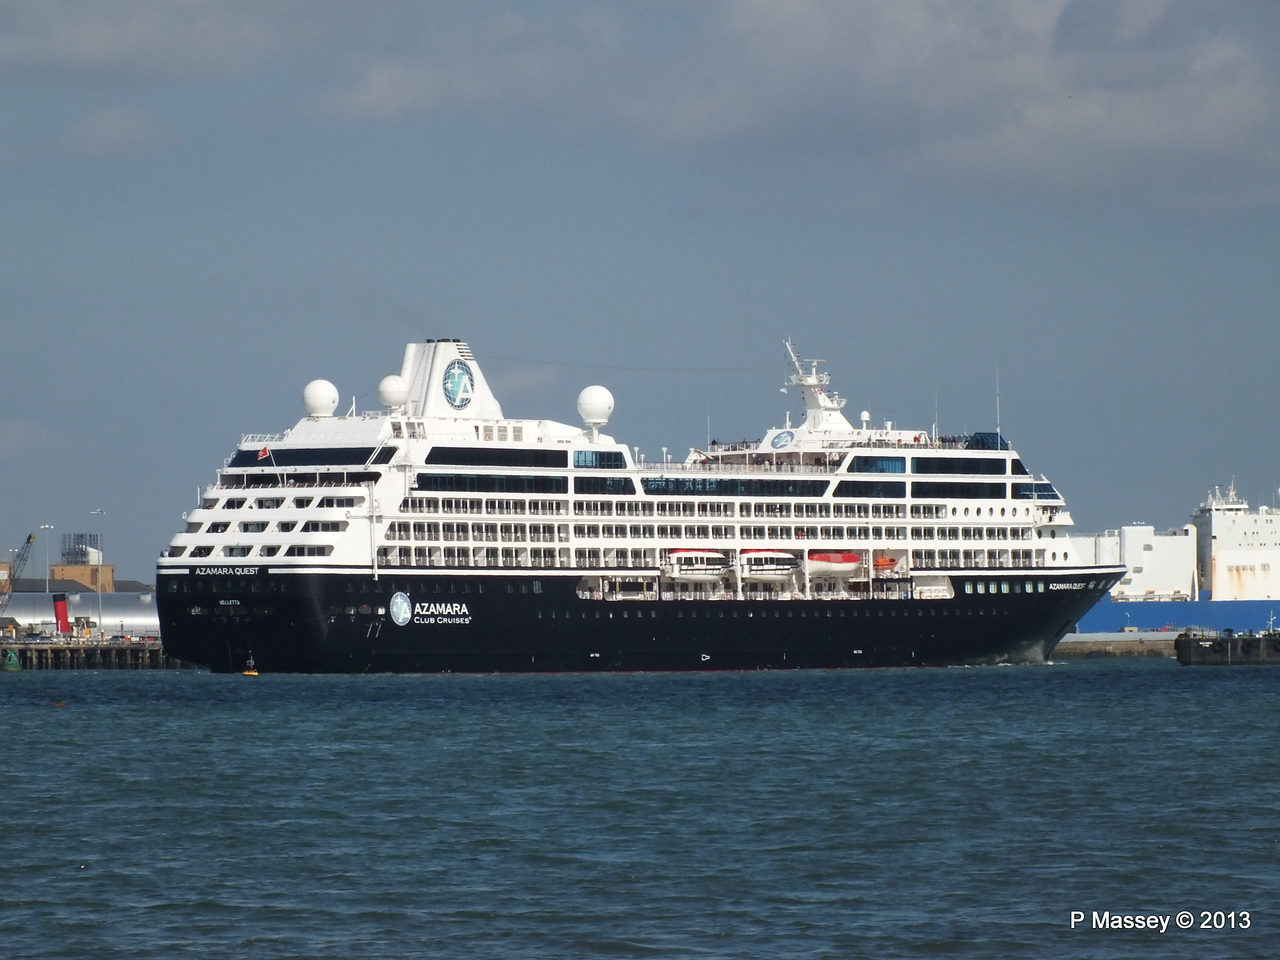 AZAMARA QUEST Departs Southampton PDM 10-06-2013 17-07-45